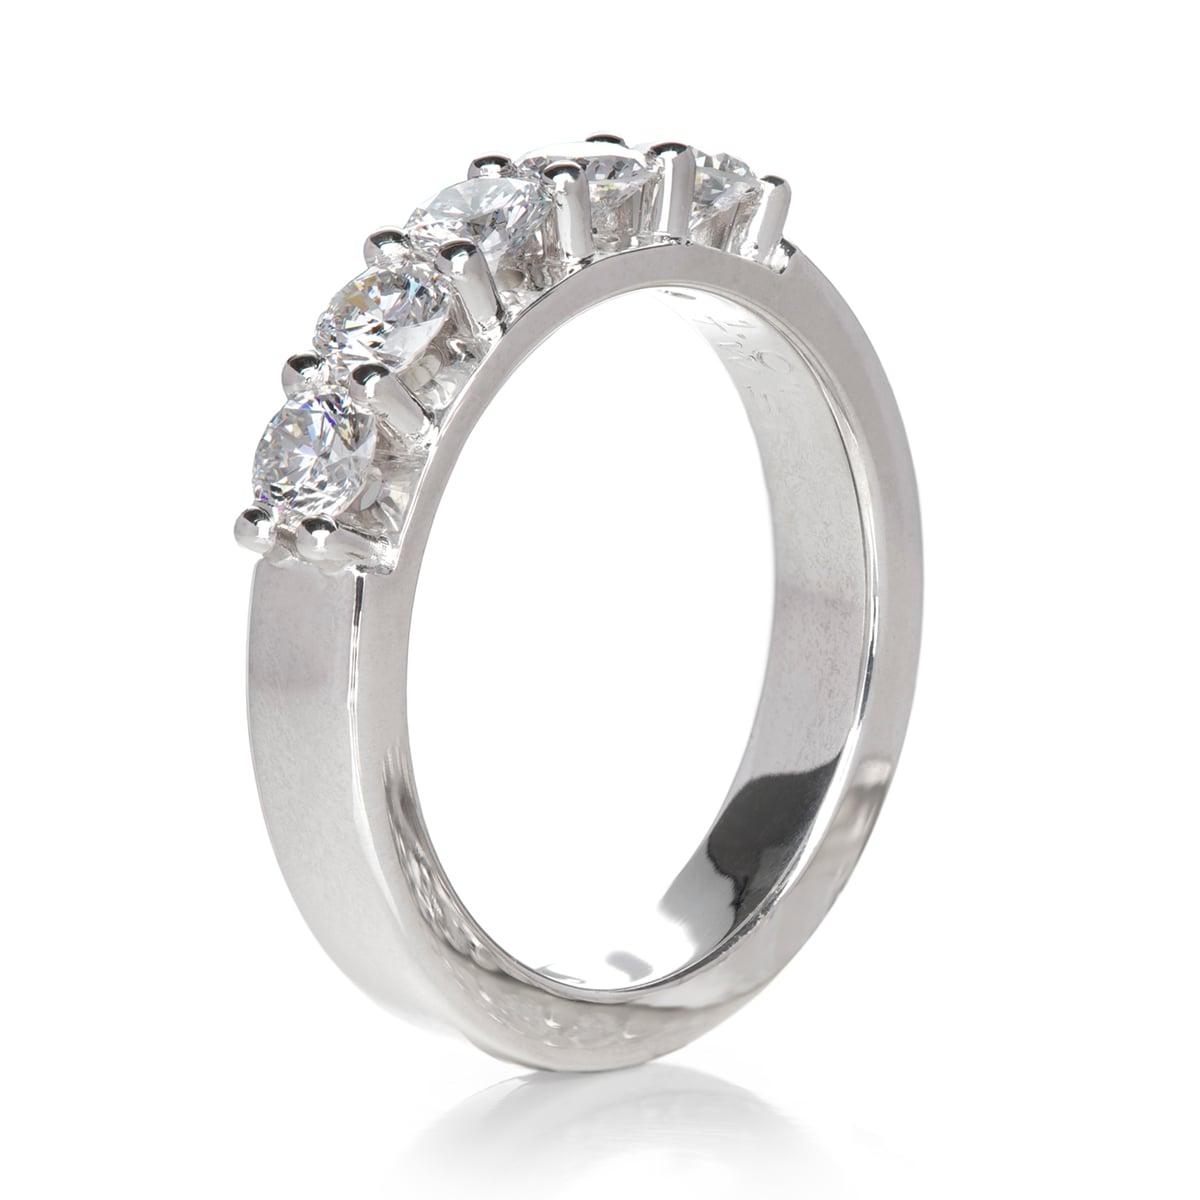 Jarl Sandin Design ForLove Diamant Vigselring Hos Jarl Sandin 1dbc021172bea